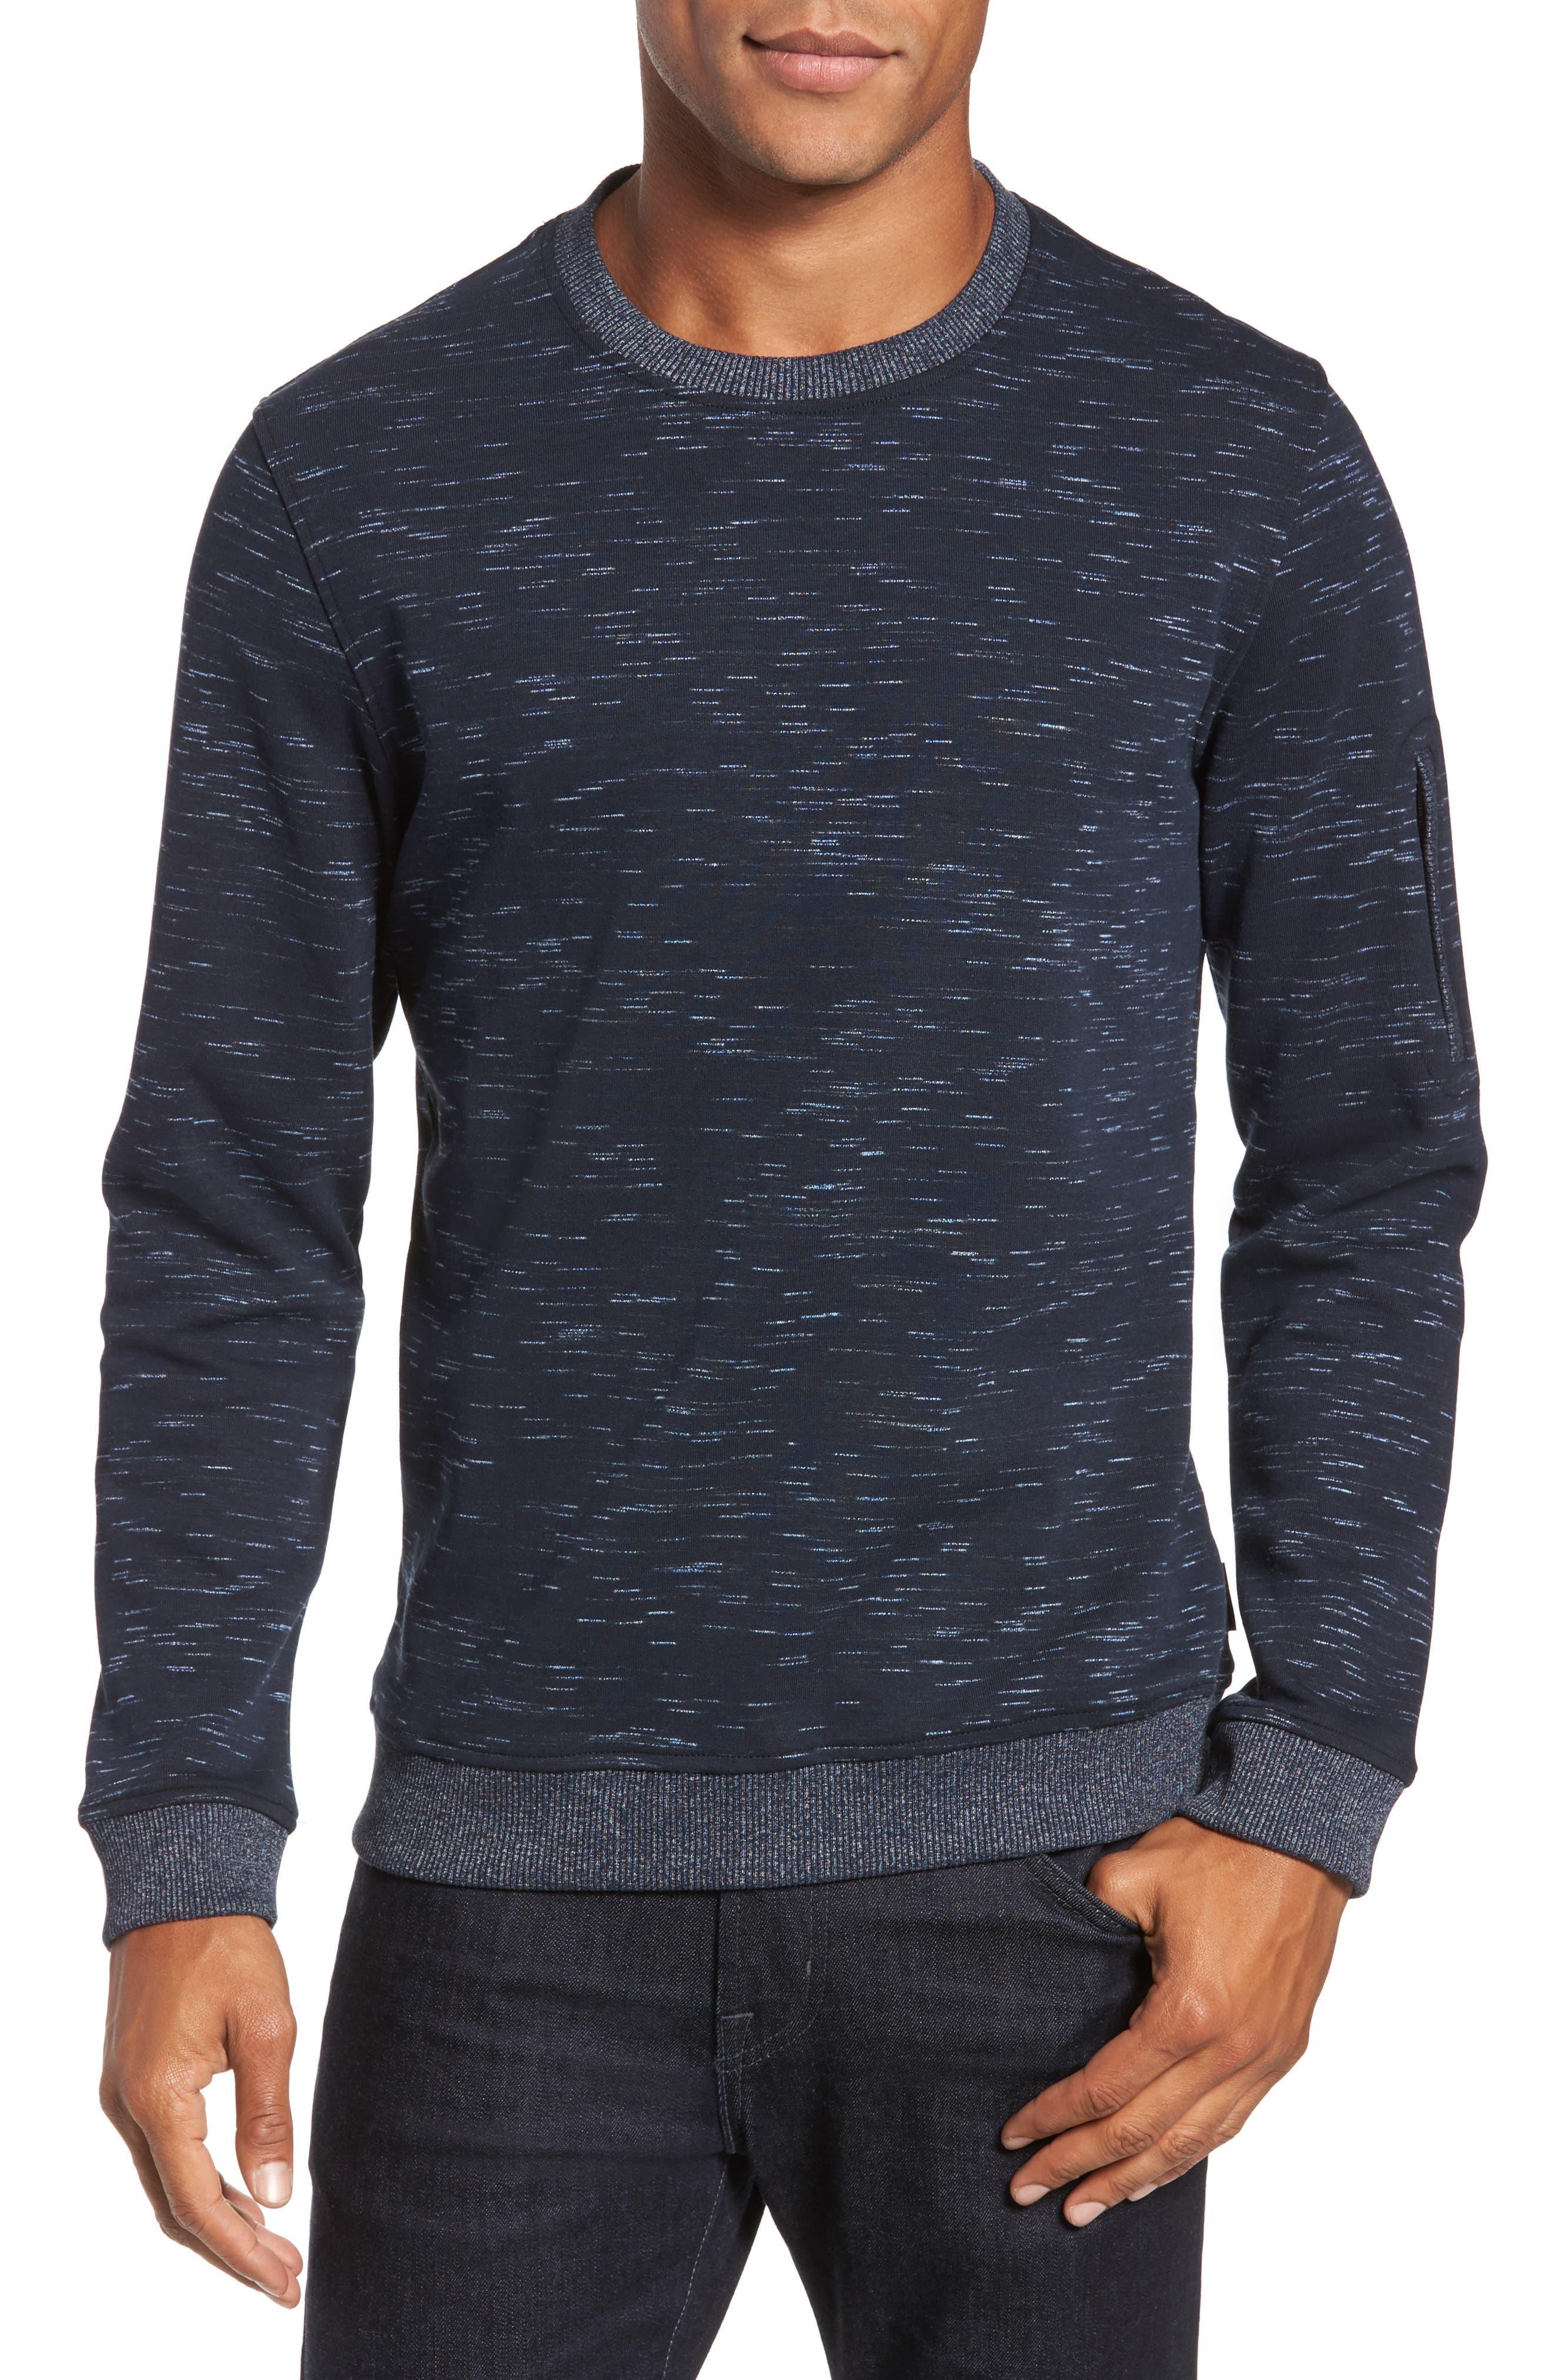 Bepay Jersey Sweatshirt,                         Main,                         color, 410